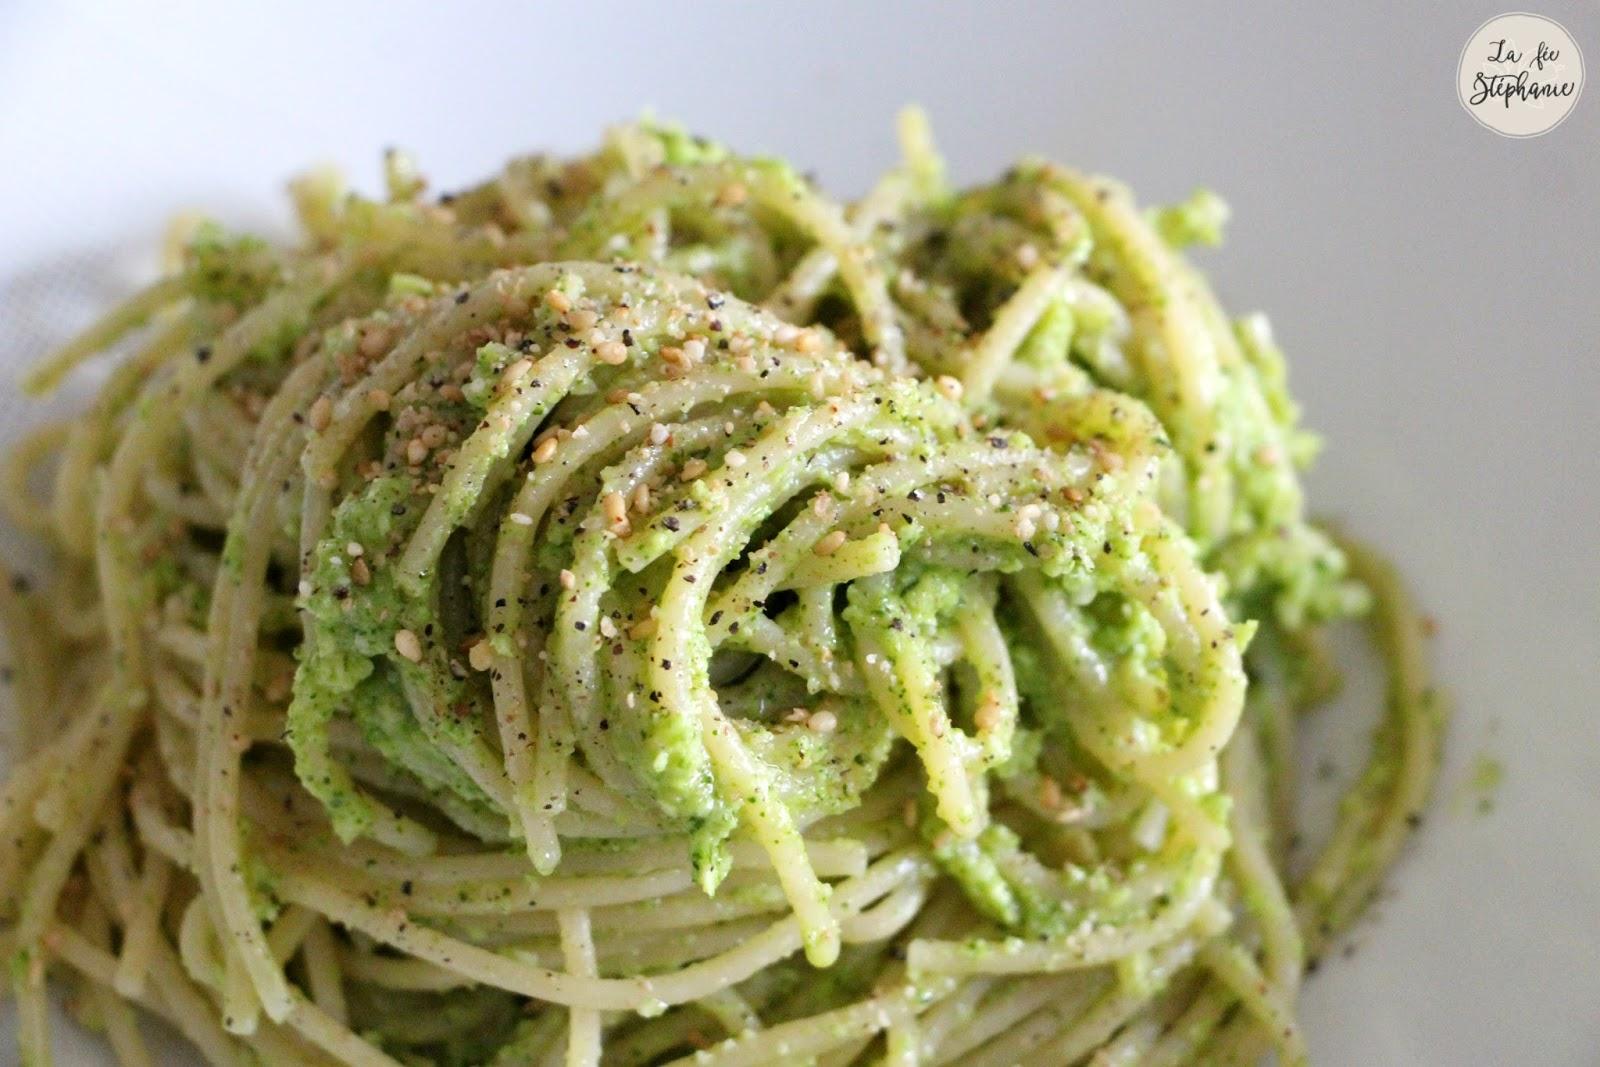 Pesto de brocoli et spaghetti sans gluten recette 100 - Cuisiner des brocolis ...